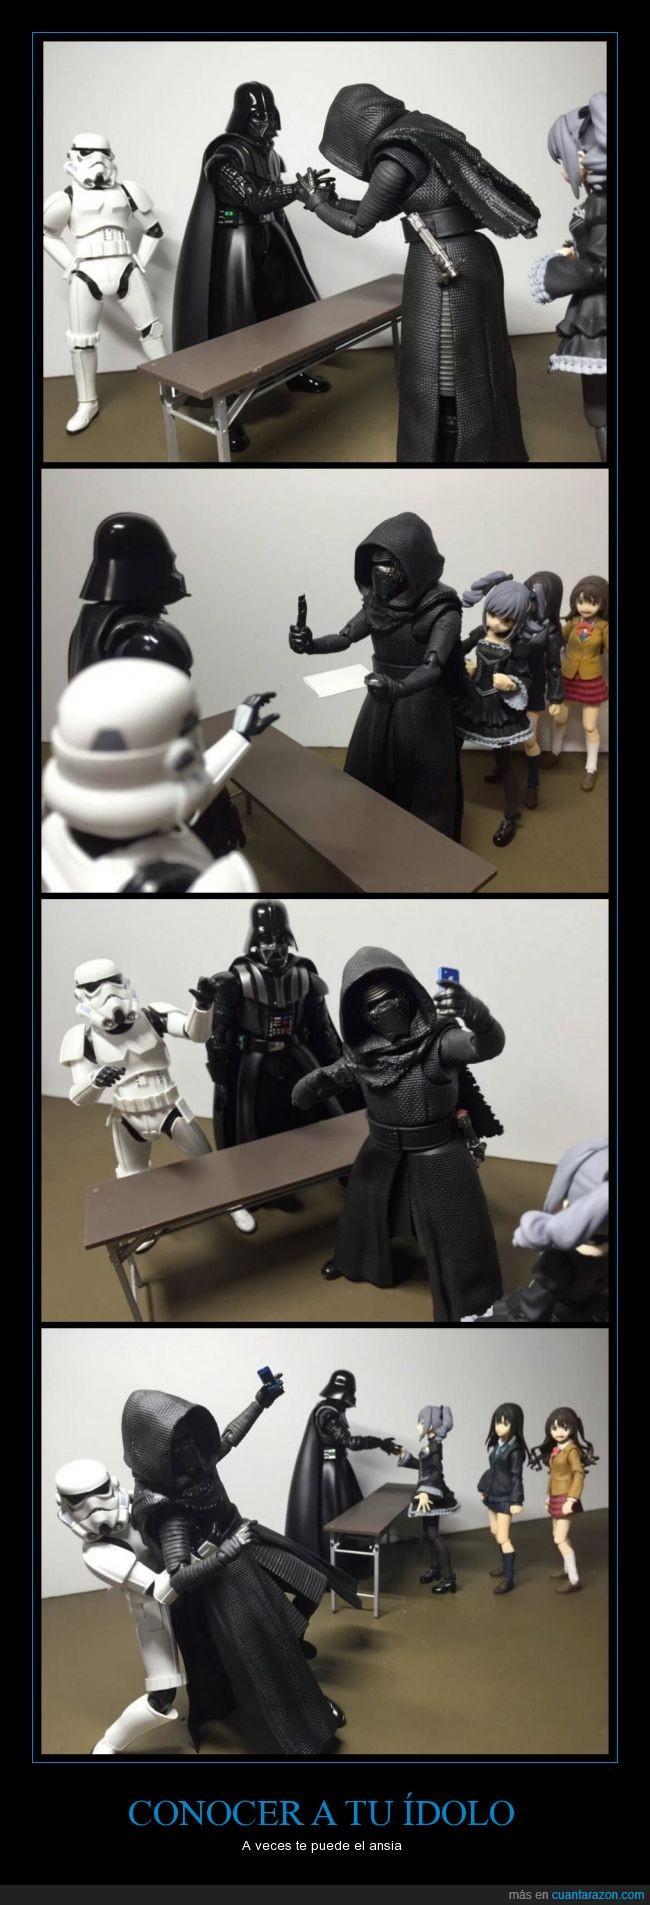 ansia,conocer,Darth Vader,fan Kylo Ren,foto,selfie,Star Wars,stormtrooper